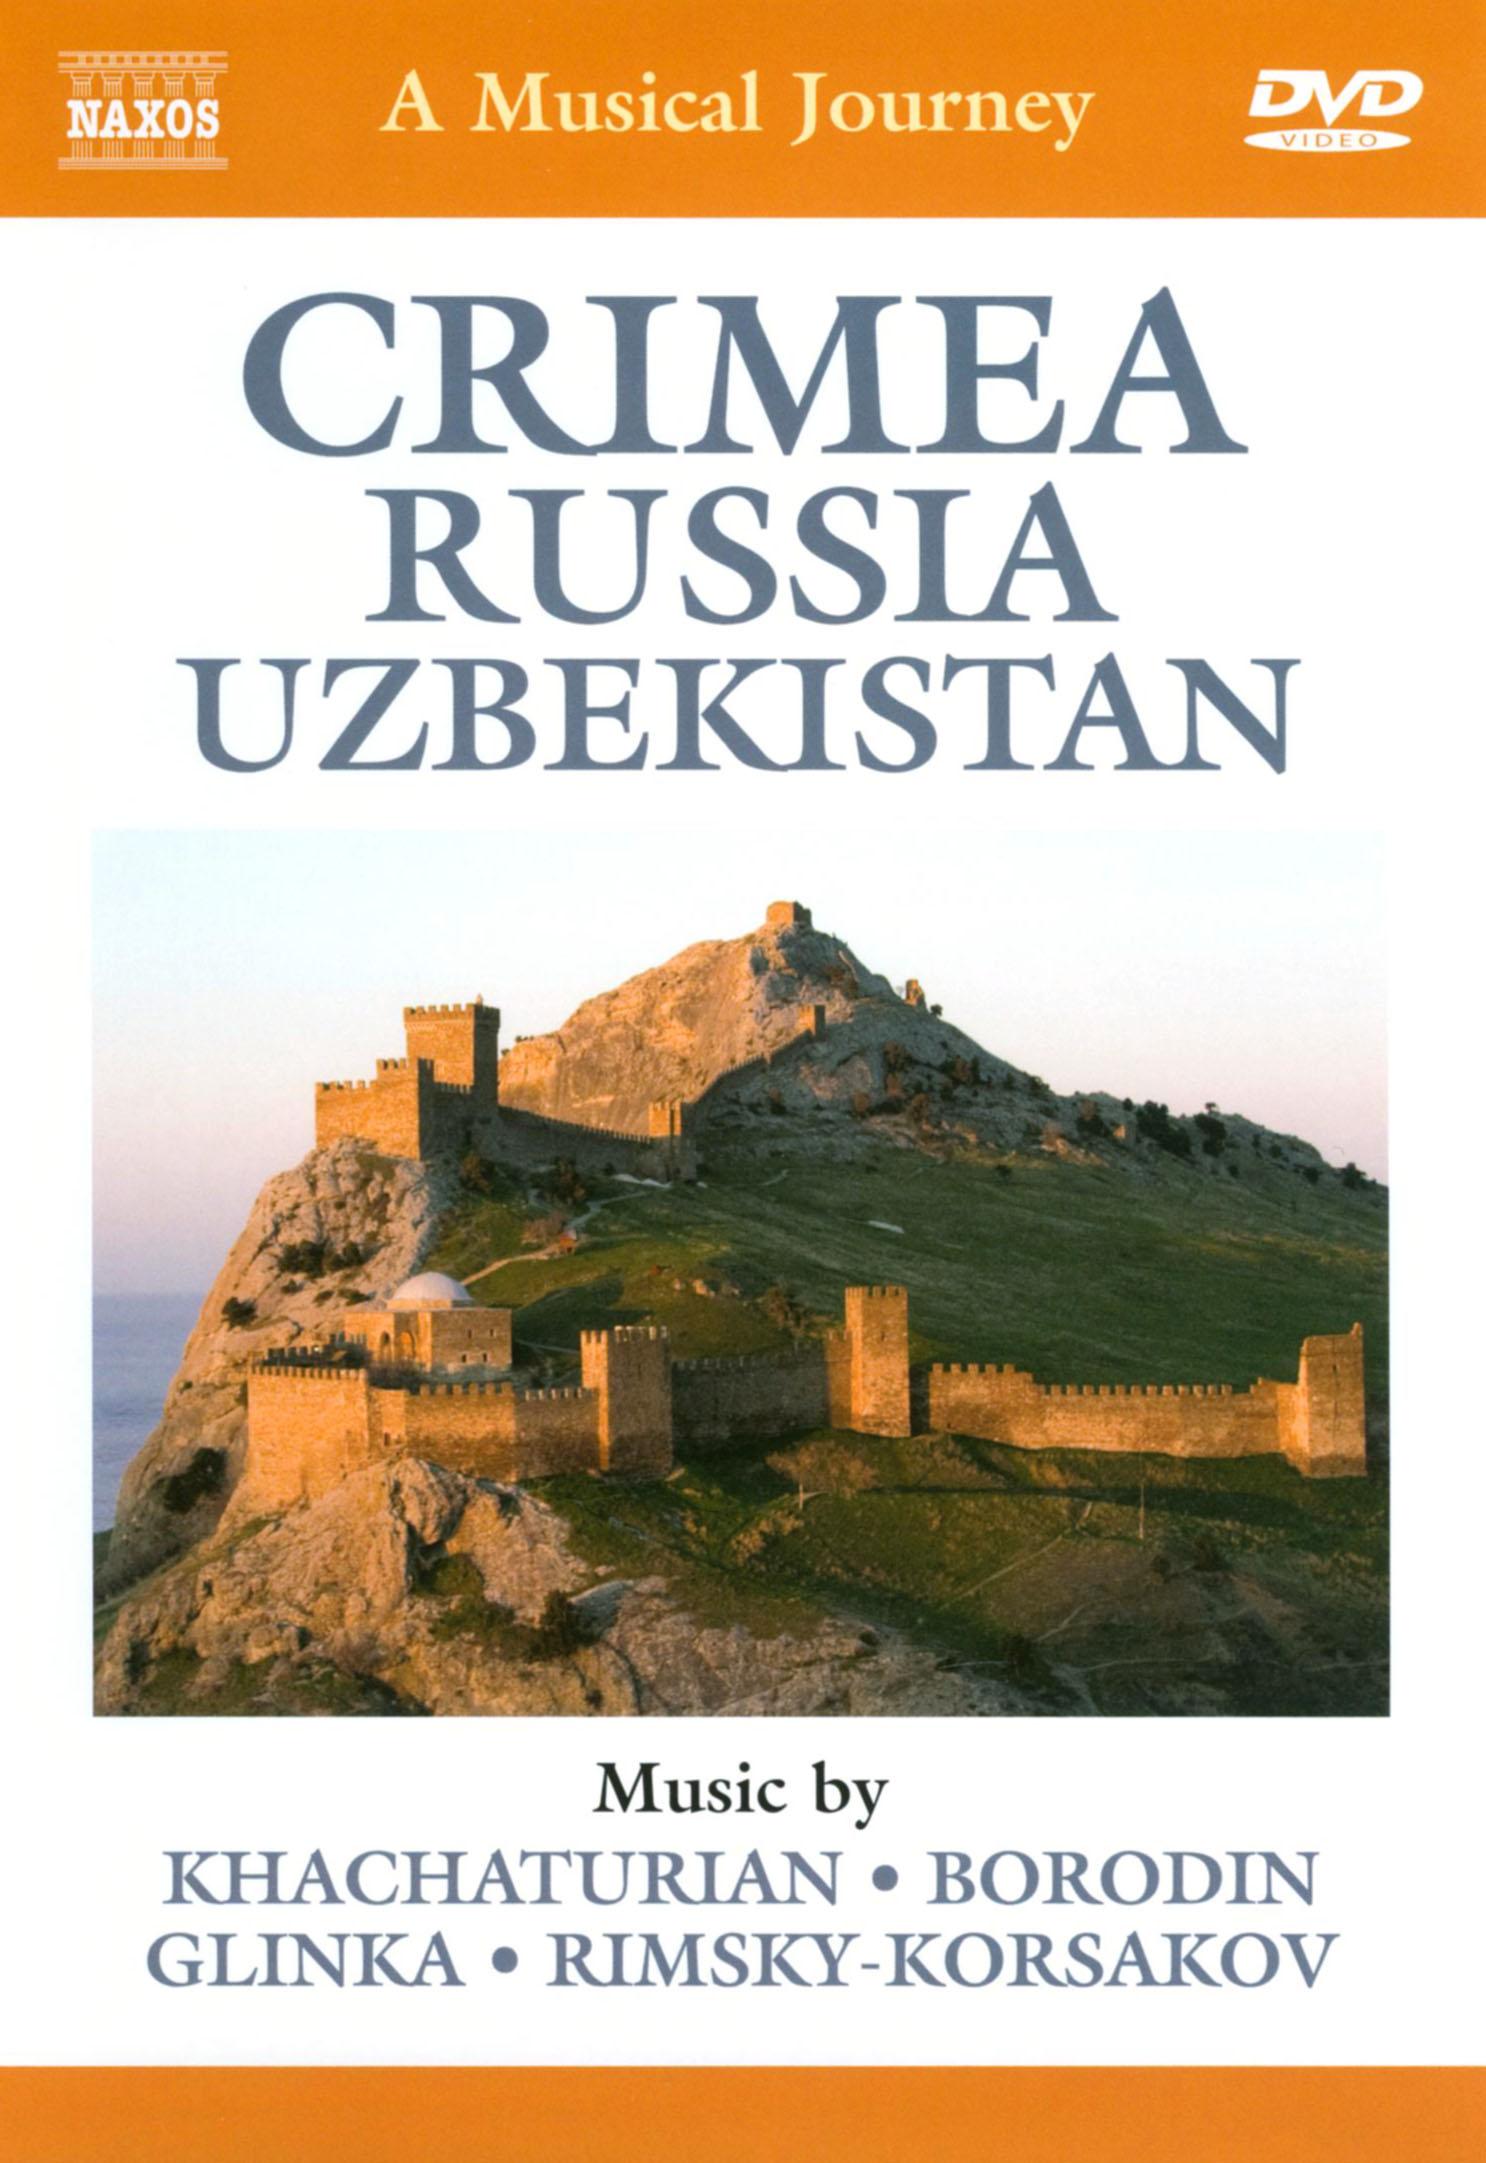 A Musical Journey: Crimea/Russia/Uzbekistan